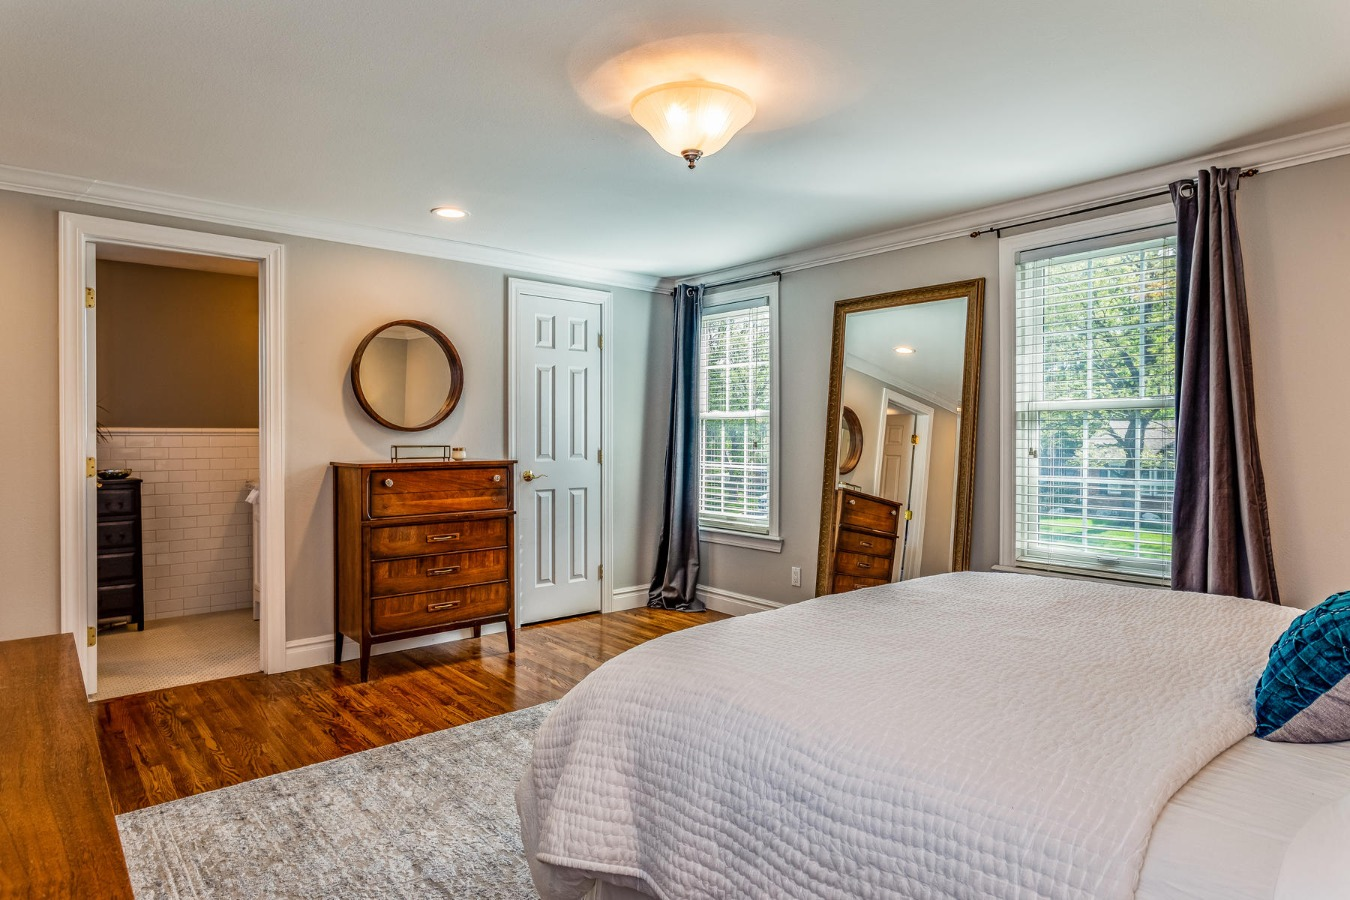 Master Bedroom to Master Bath